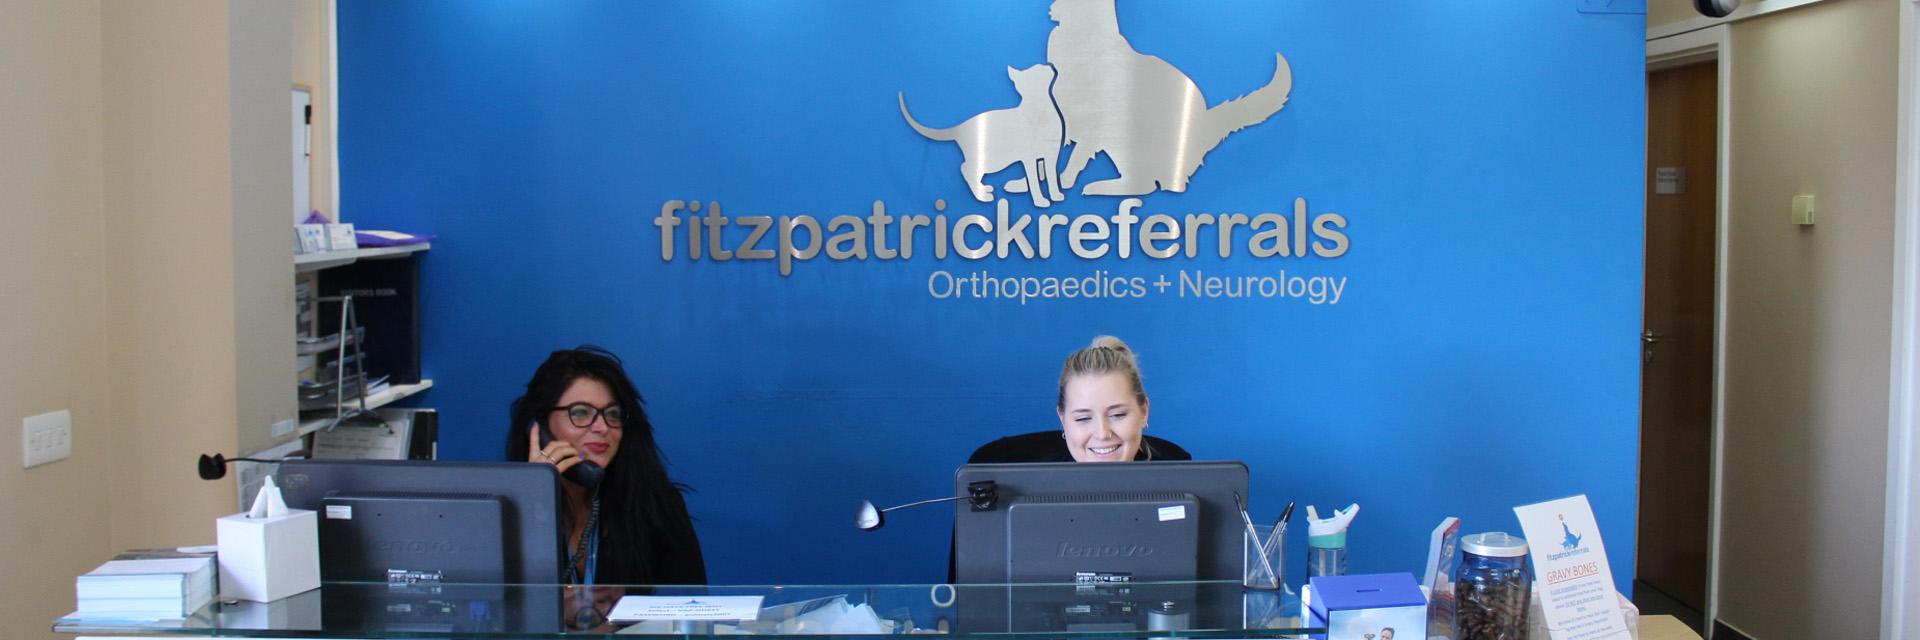 Receptionists at Fitzpatrick Referrals Orthopaedics and Neurology